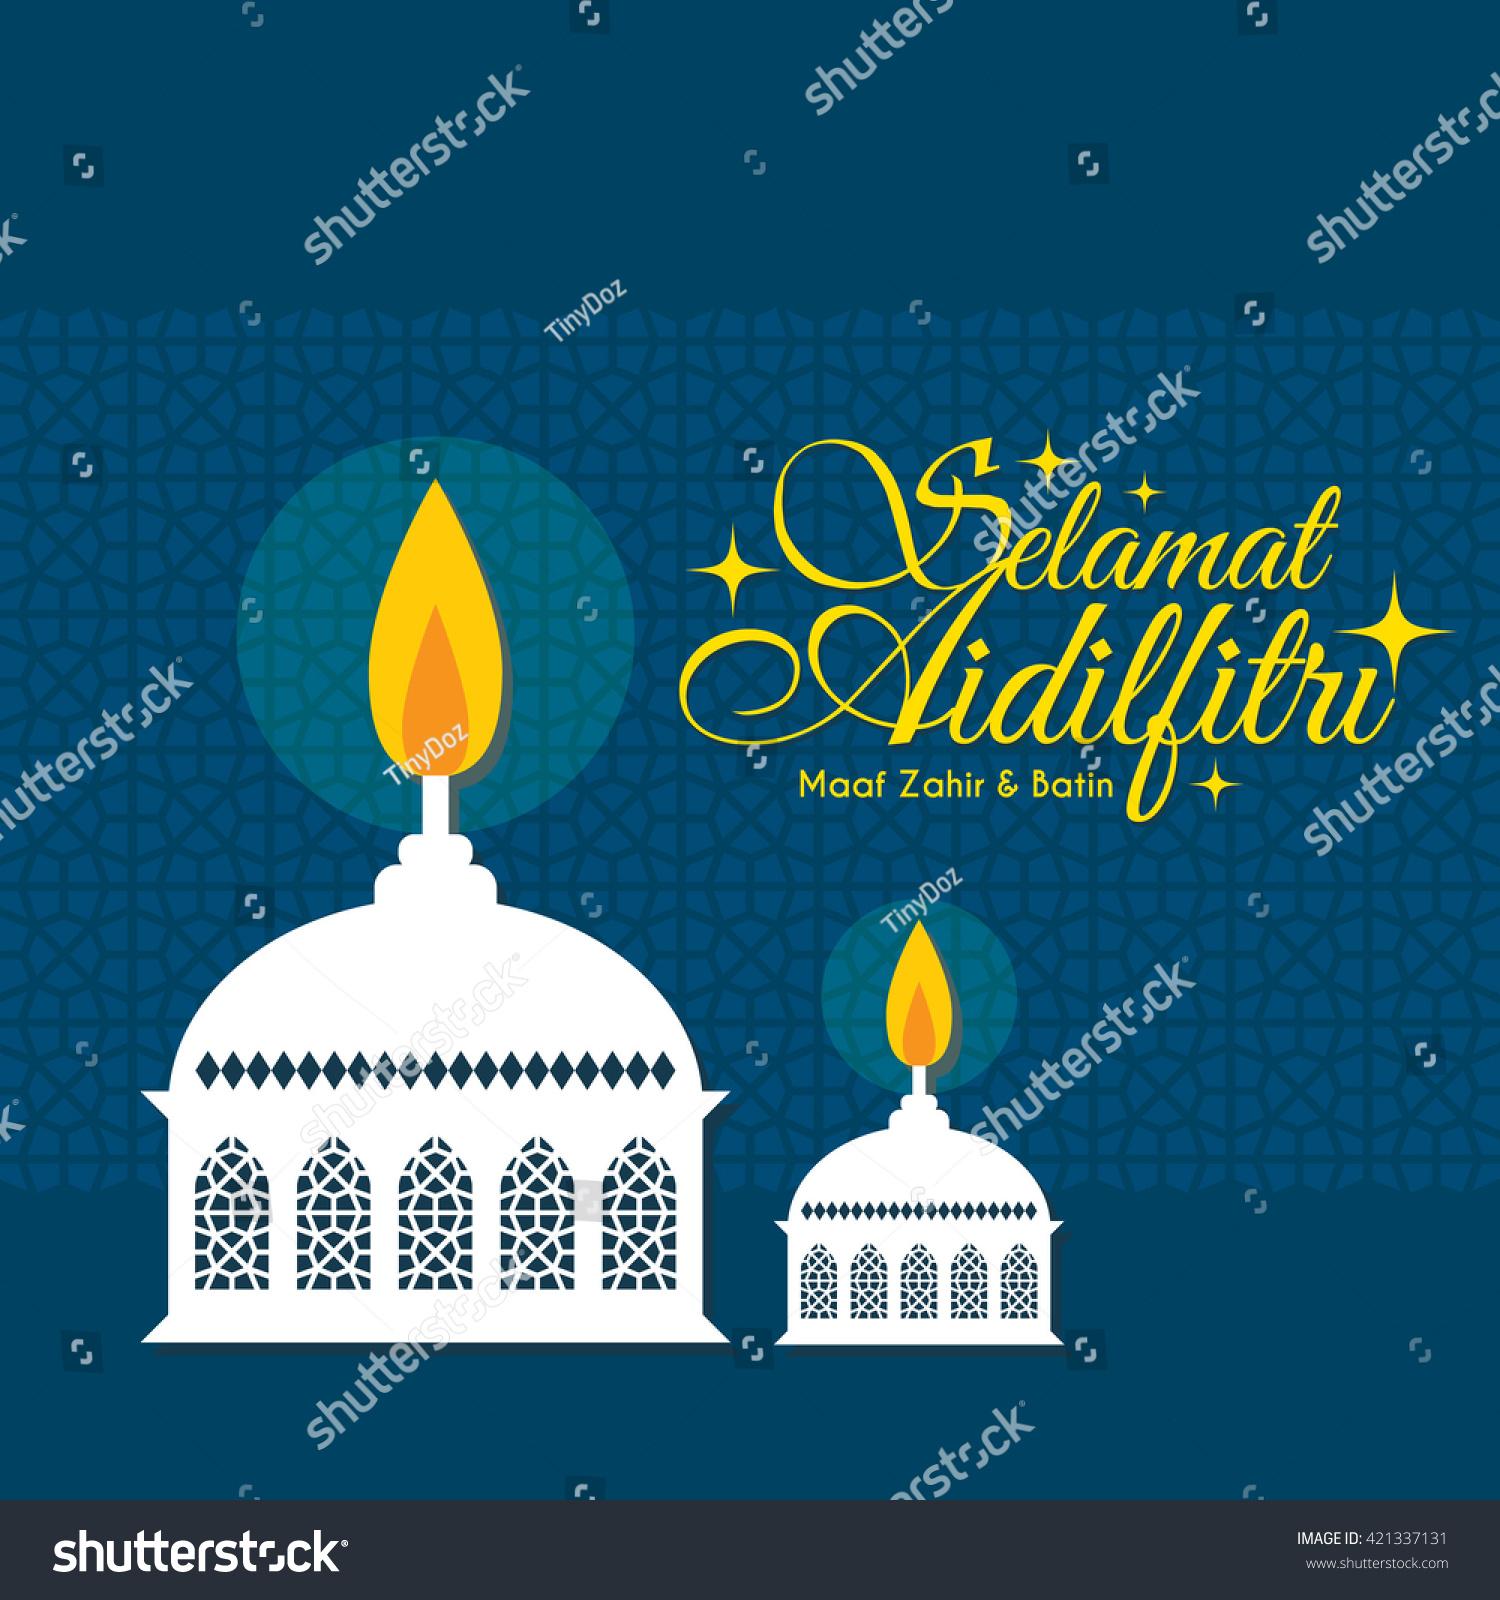 Vector muslim oil lamp pelita islamic stock vector 421337131 vector muslim oil lamp pelita with islamic pattern background selamat aidilfitri greeting card kristyandbryce Images